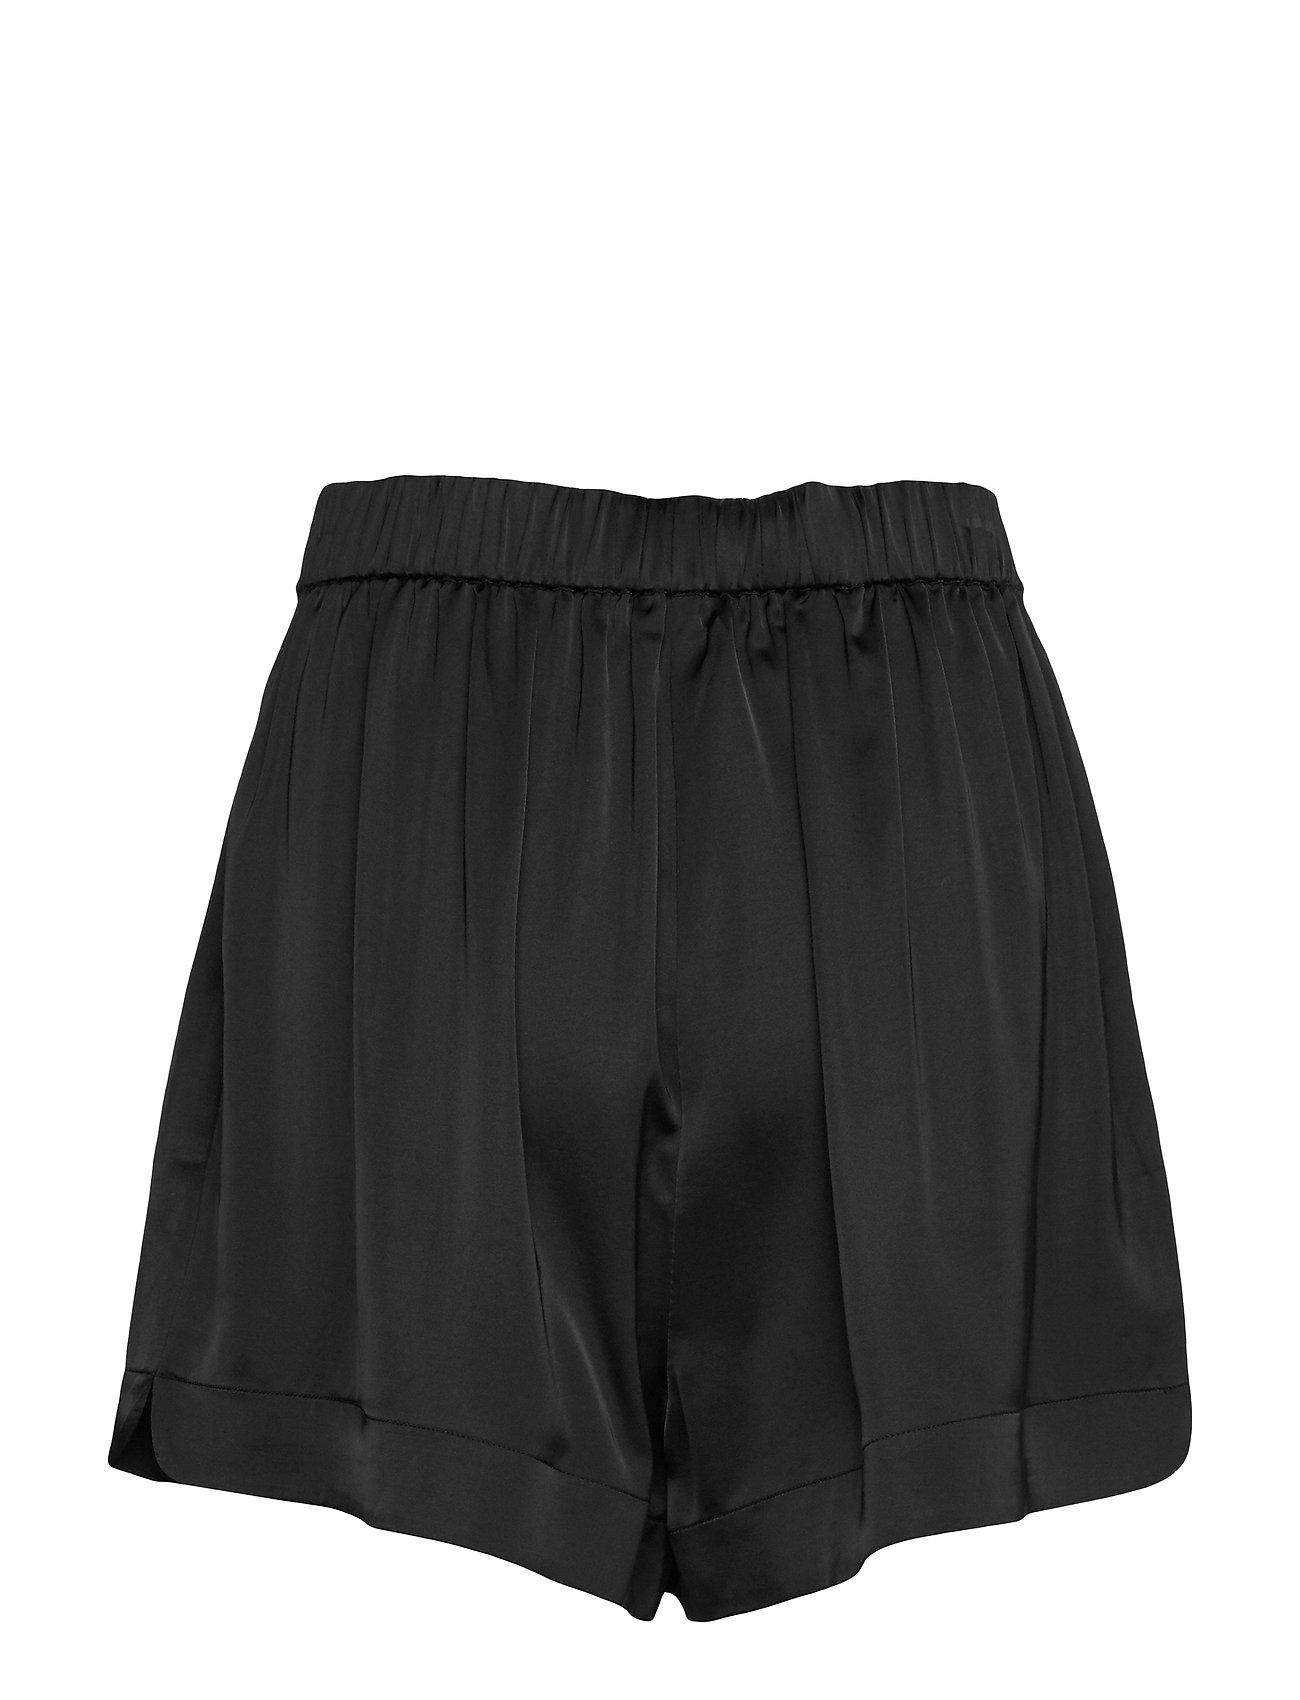 2NDDAY 2nd Caitlyn (Black) 750 kr | Stort utbud av designermärken xbnP9bim